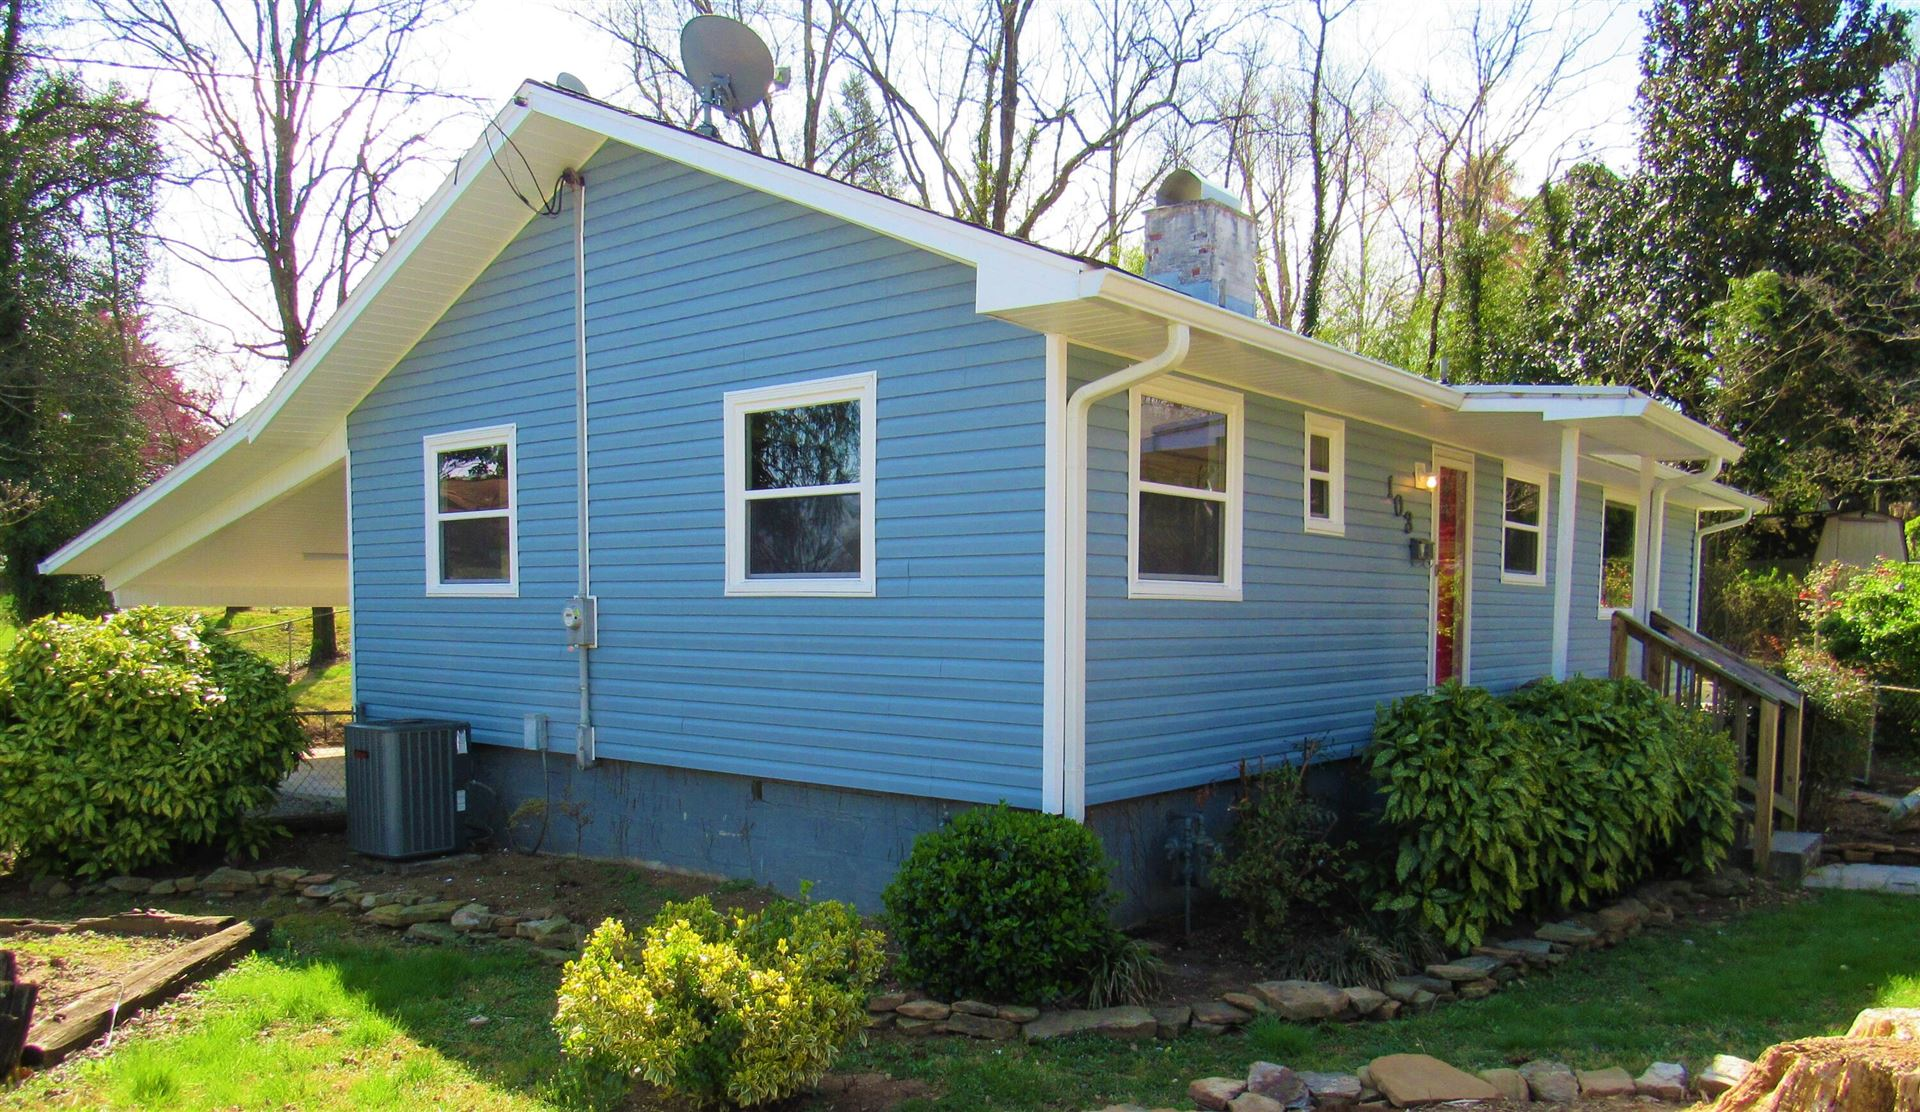 Photo of 103 E Price Rd, Oak Ridge, TN 37830 (MLS # 1146783)